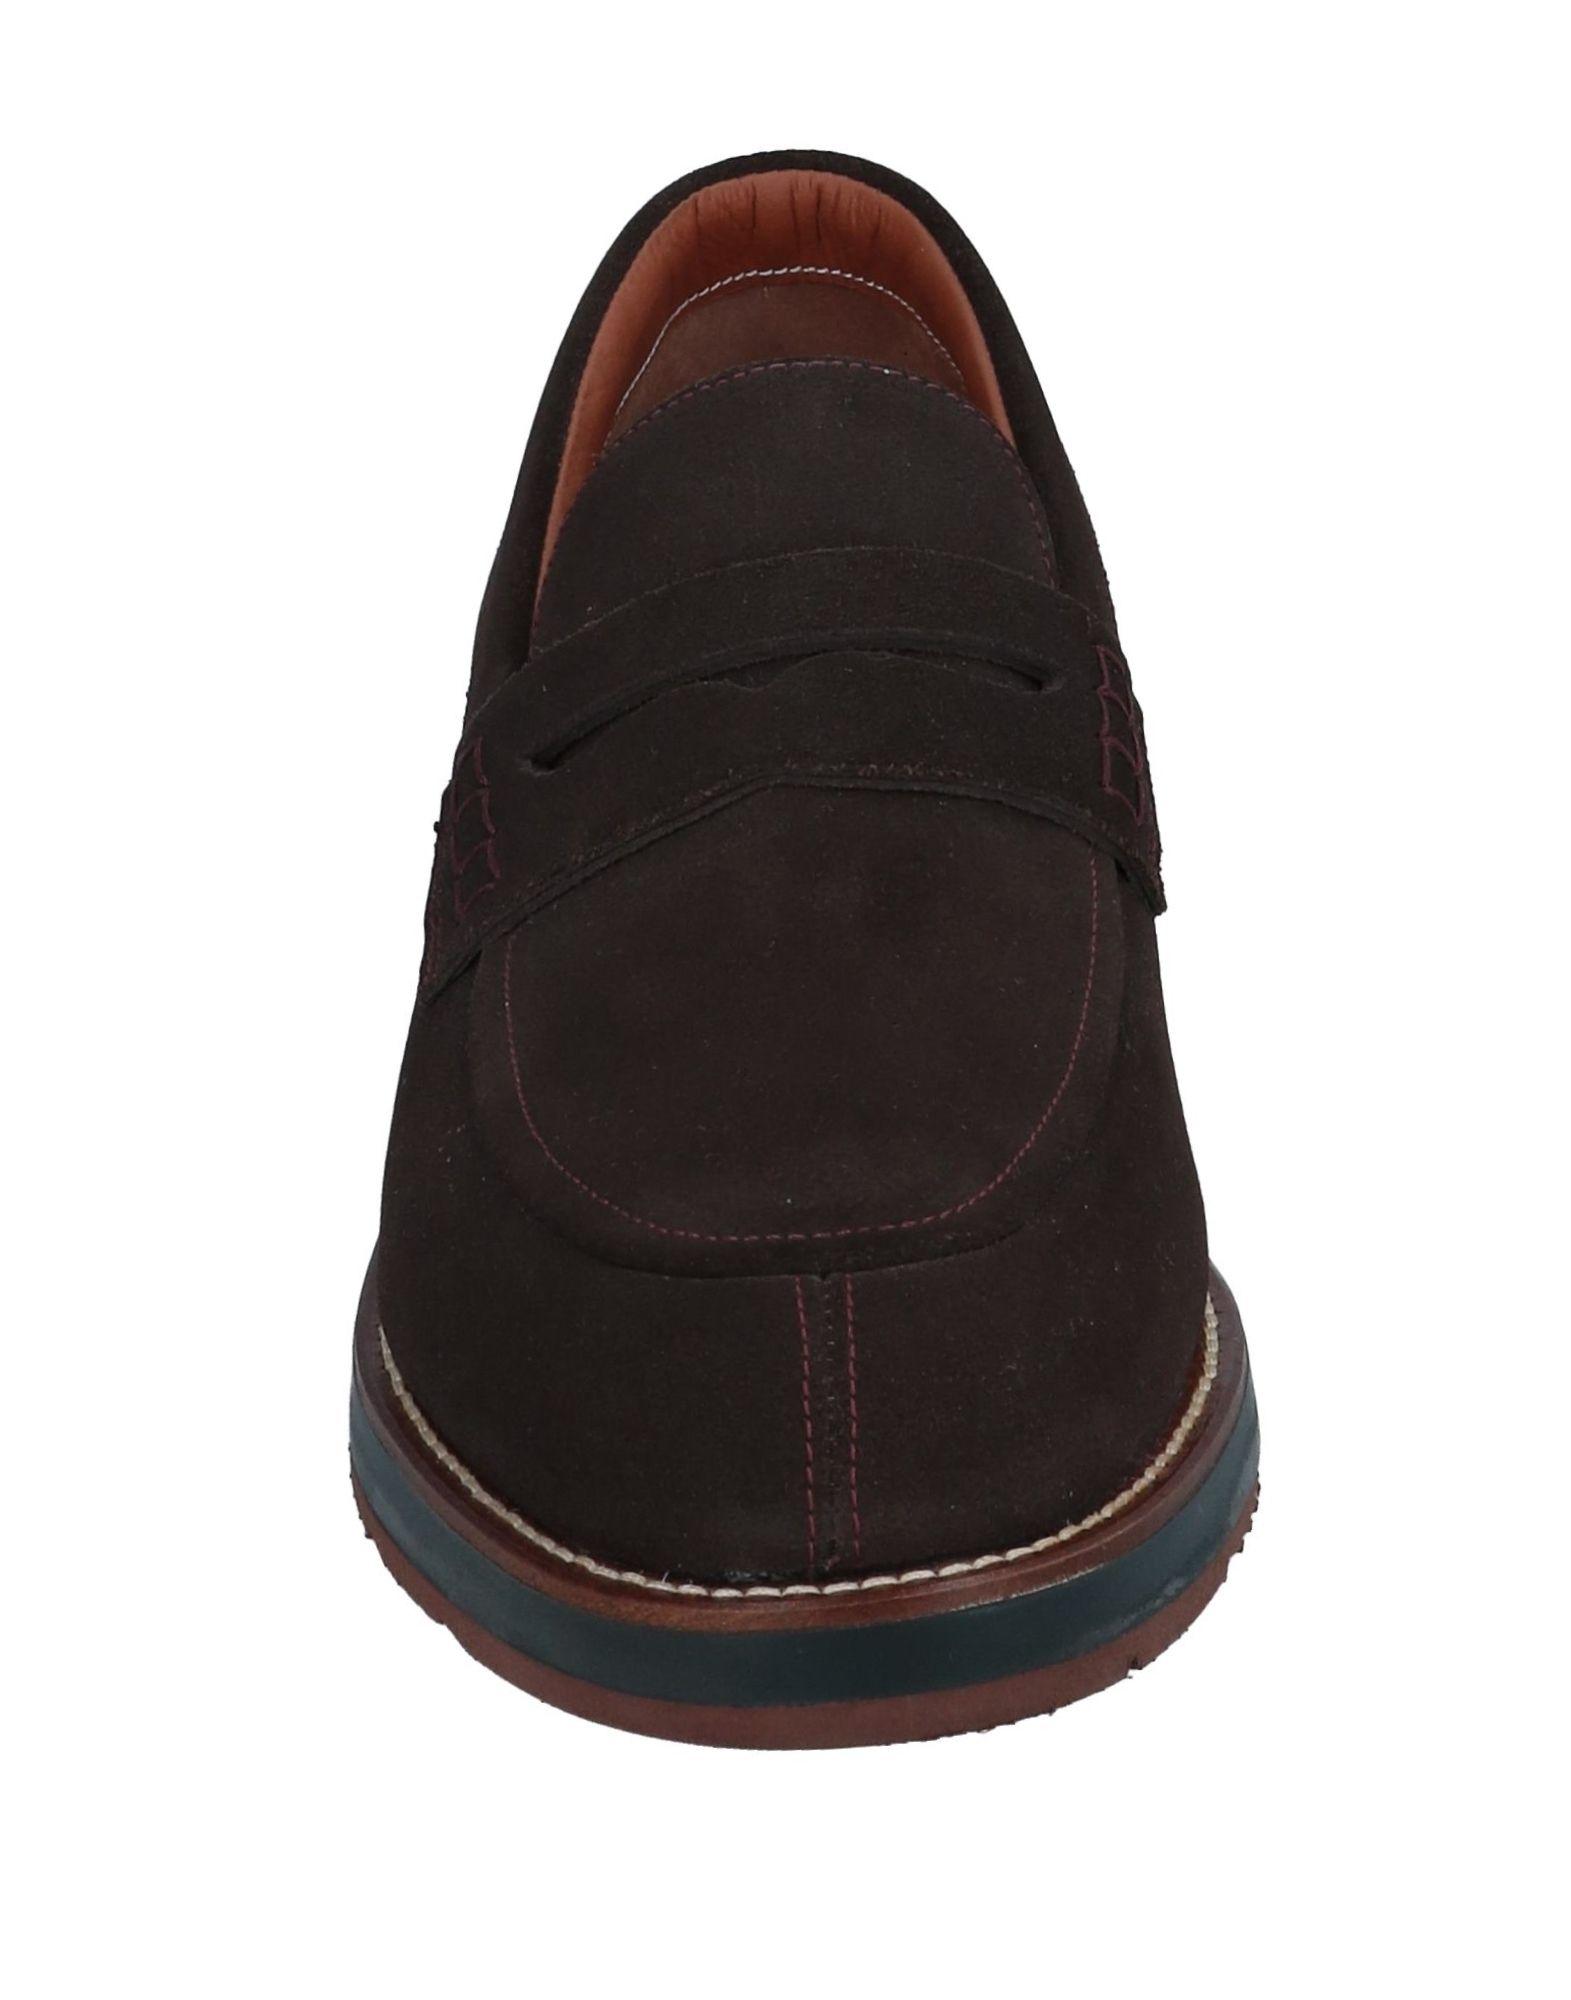 Rabatt echte  Schuhe Barleycorn Mokassins Herren  echte 11549029KN 247f60